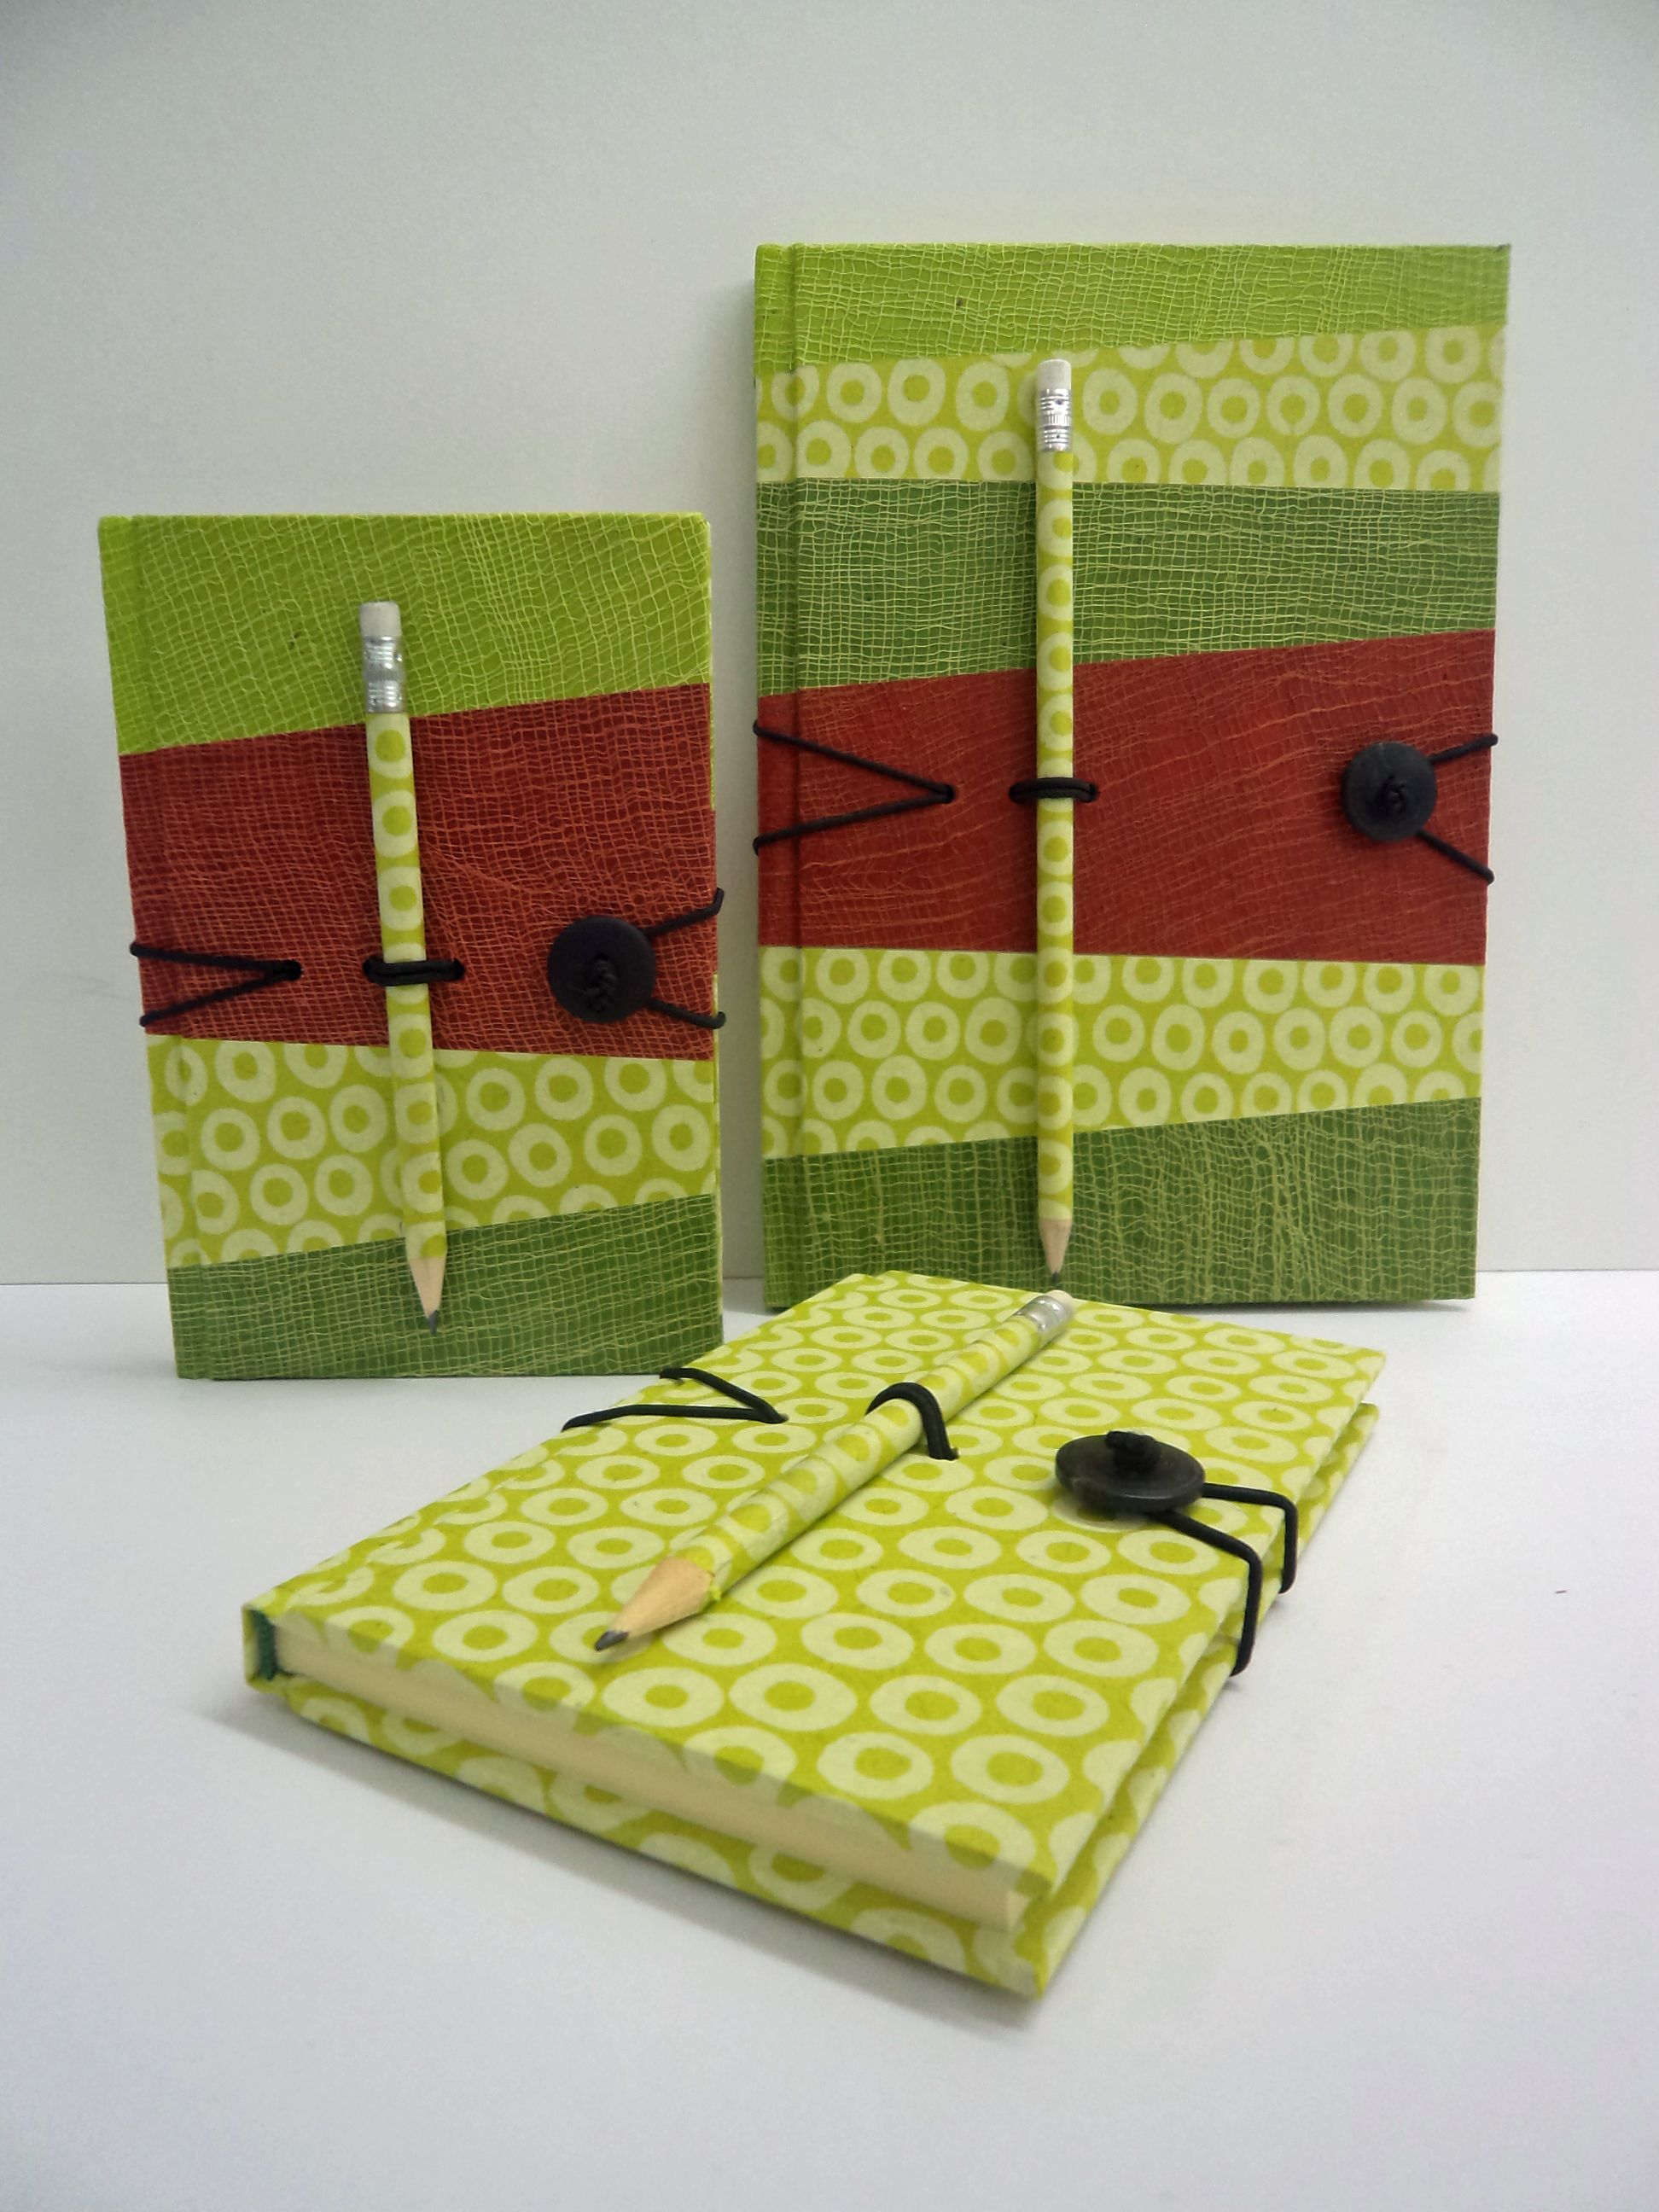 i nuovi quaderni ti va per l 39 estate 2014 quaderni pinterest buchbinden buecher und buch. Black Bedroom Furniture Sets. Home Design Ideas